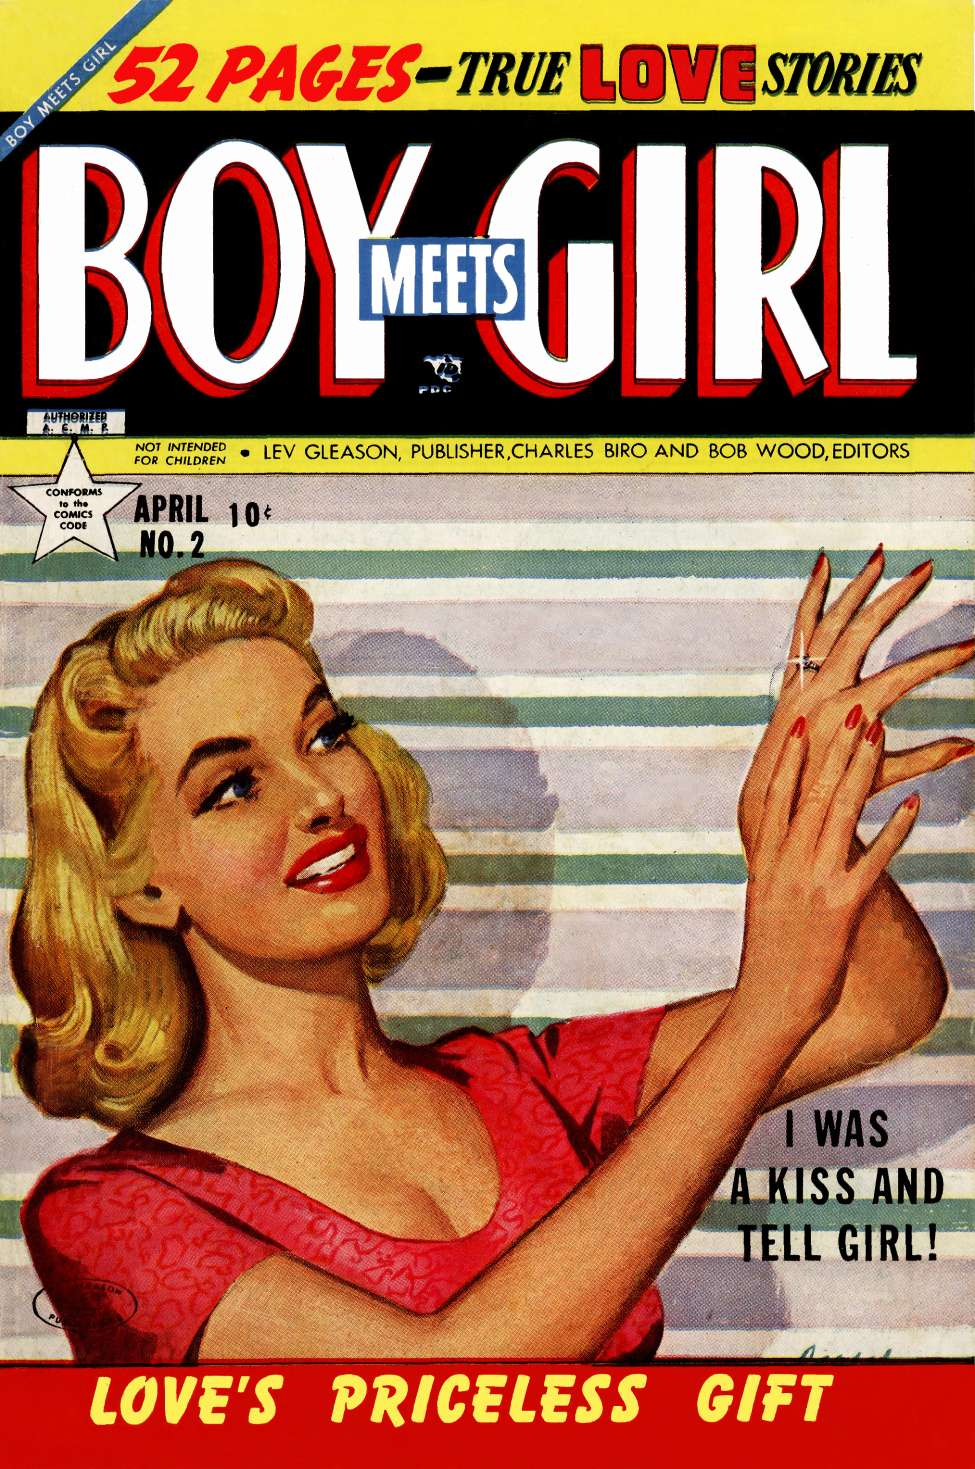 Boy Meets Girl #2, Lev Gleason